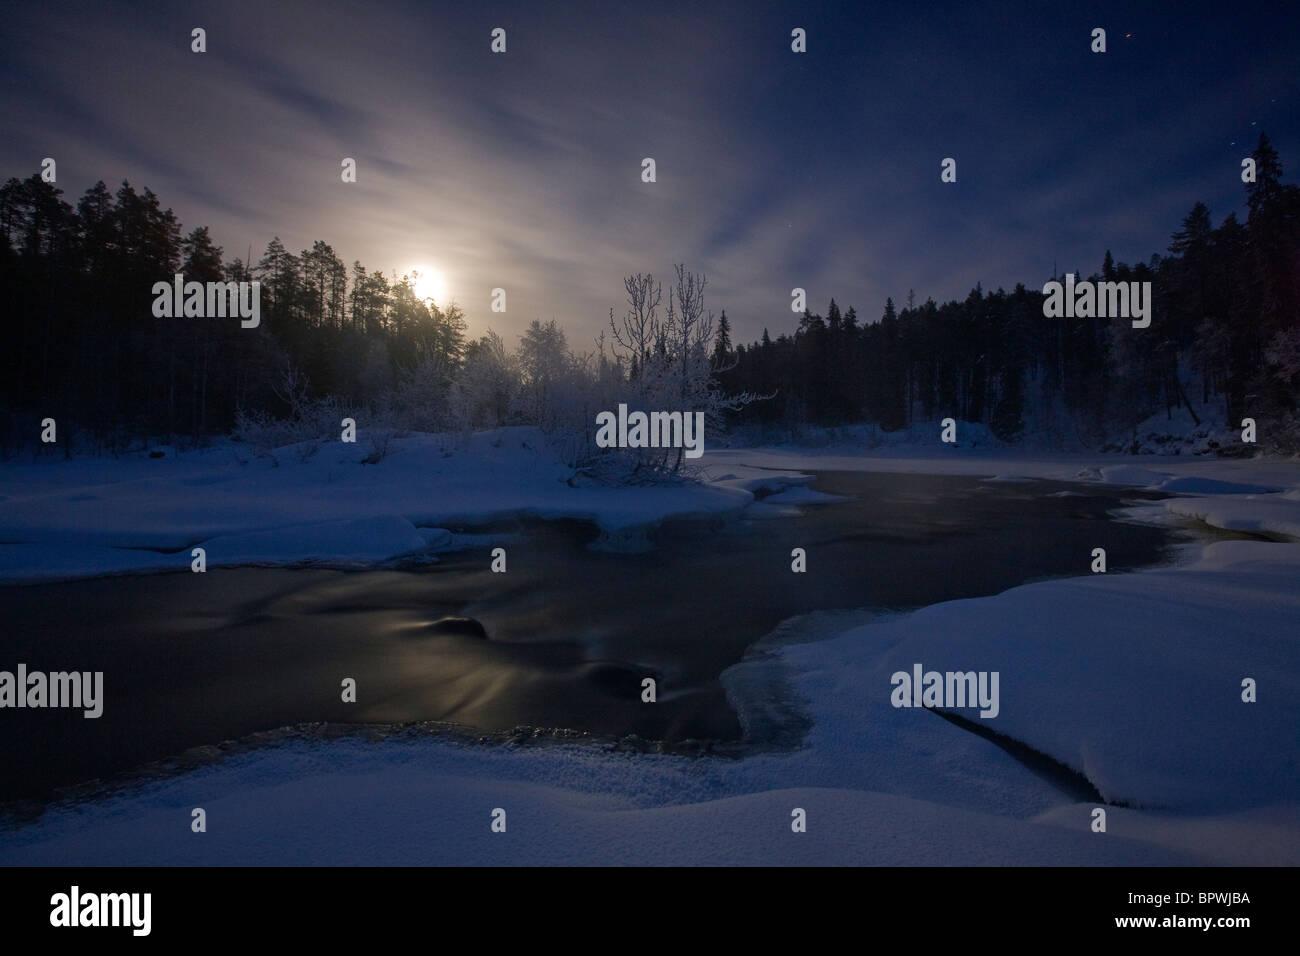 Ore del sorgere sul fiume Oulanka in Oulanka National Park, Finlandia. Immagini Stock